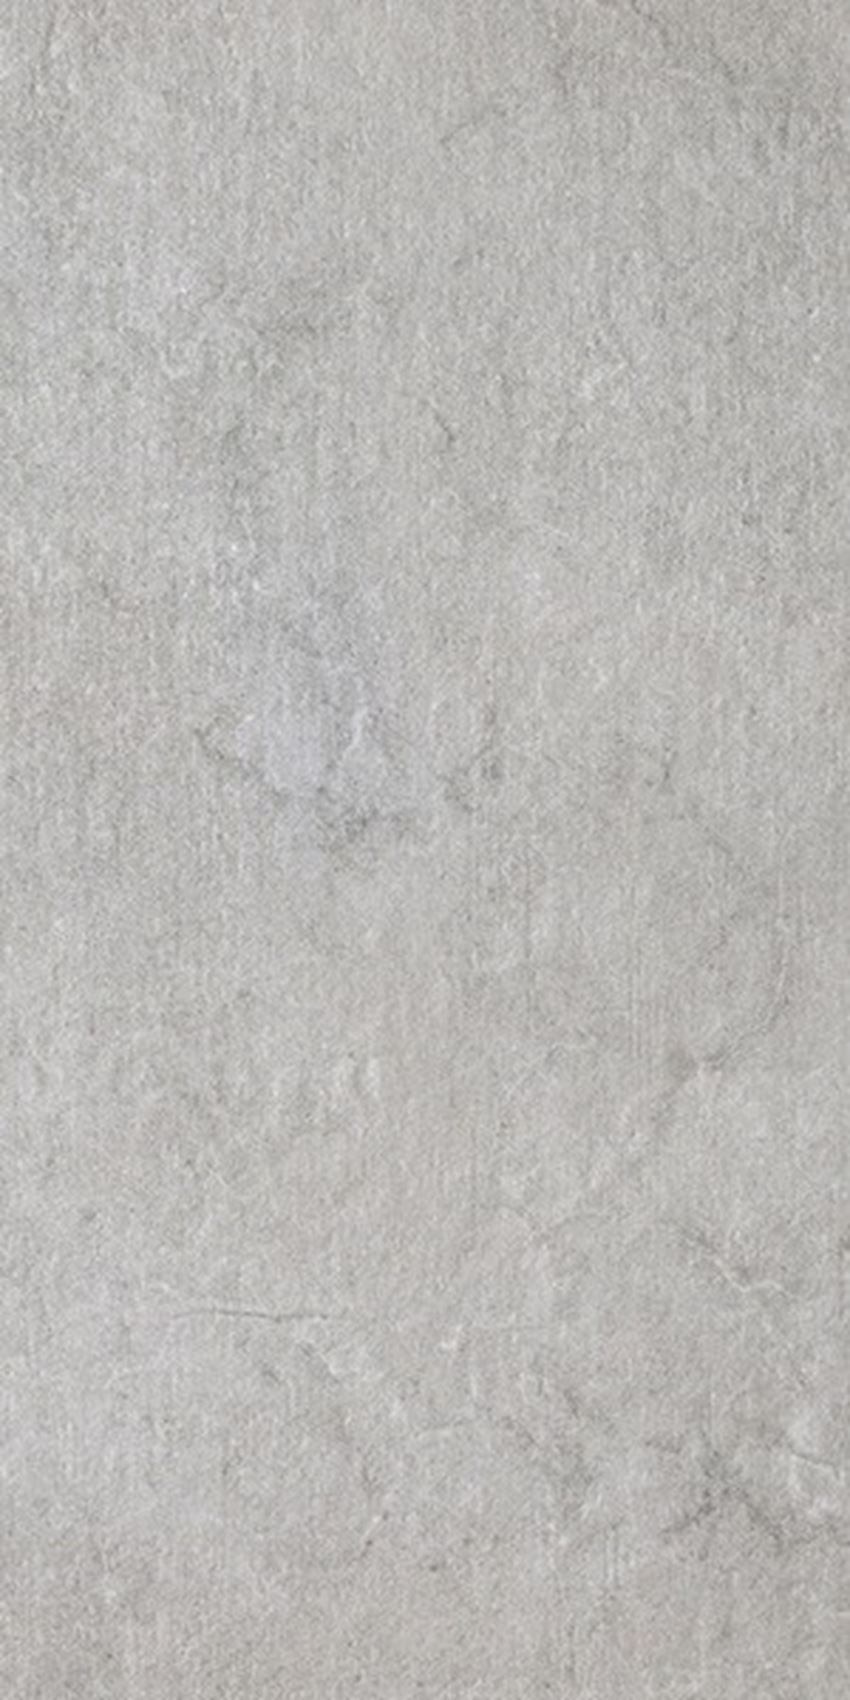 Płytka uniwersalna 29,7x59,7 cm  Ceramika Gres Estile ETL 12